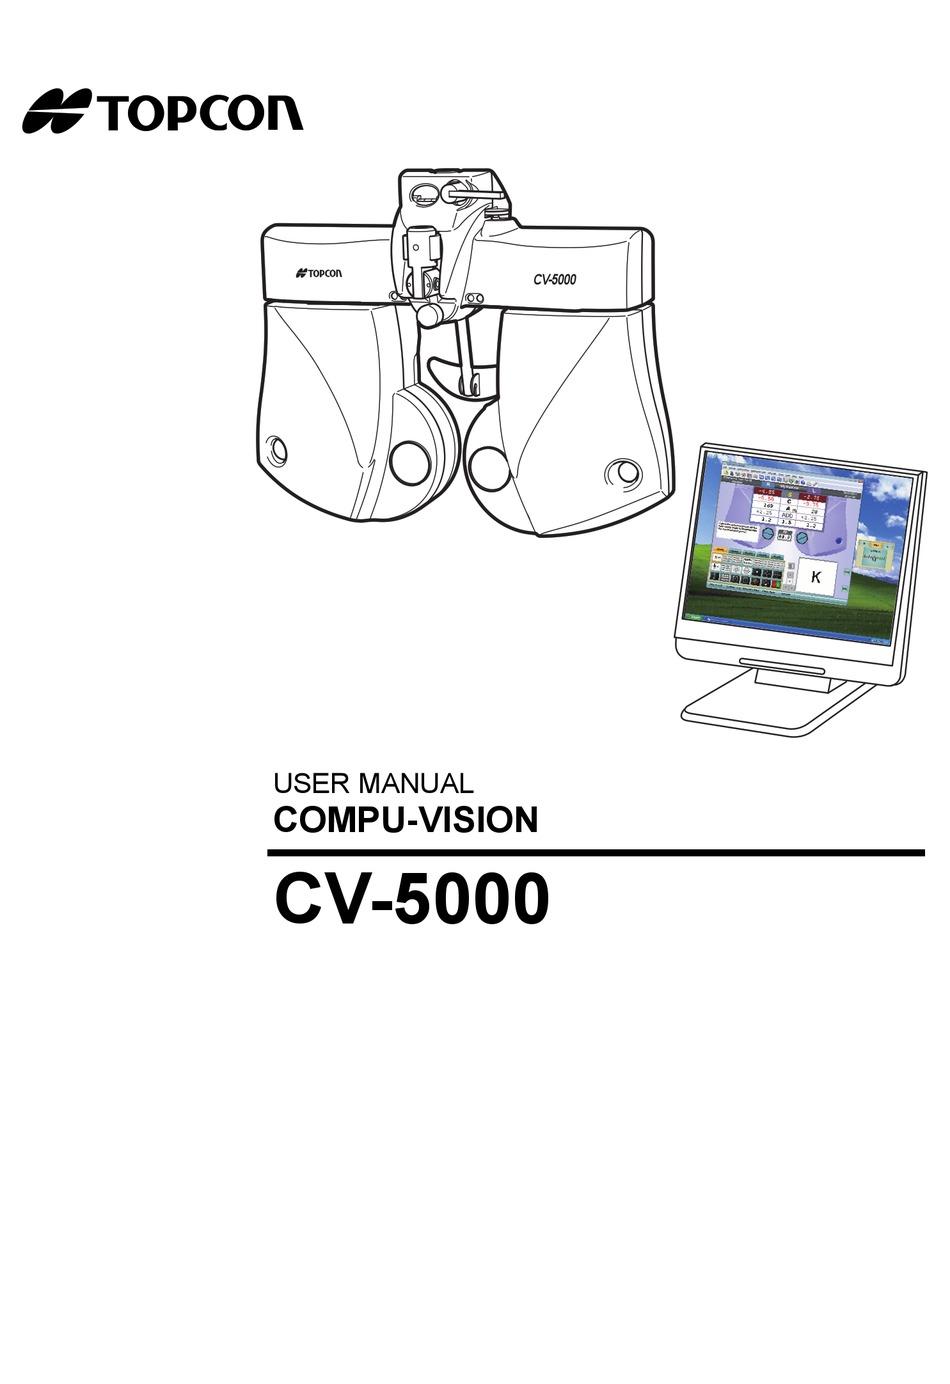 TOPCON COMPU-VISION CV-5000 USER MANUAL Pdf Download